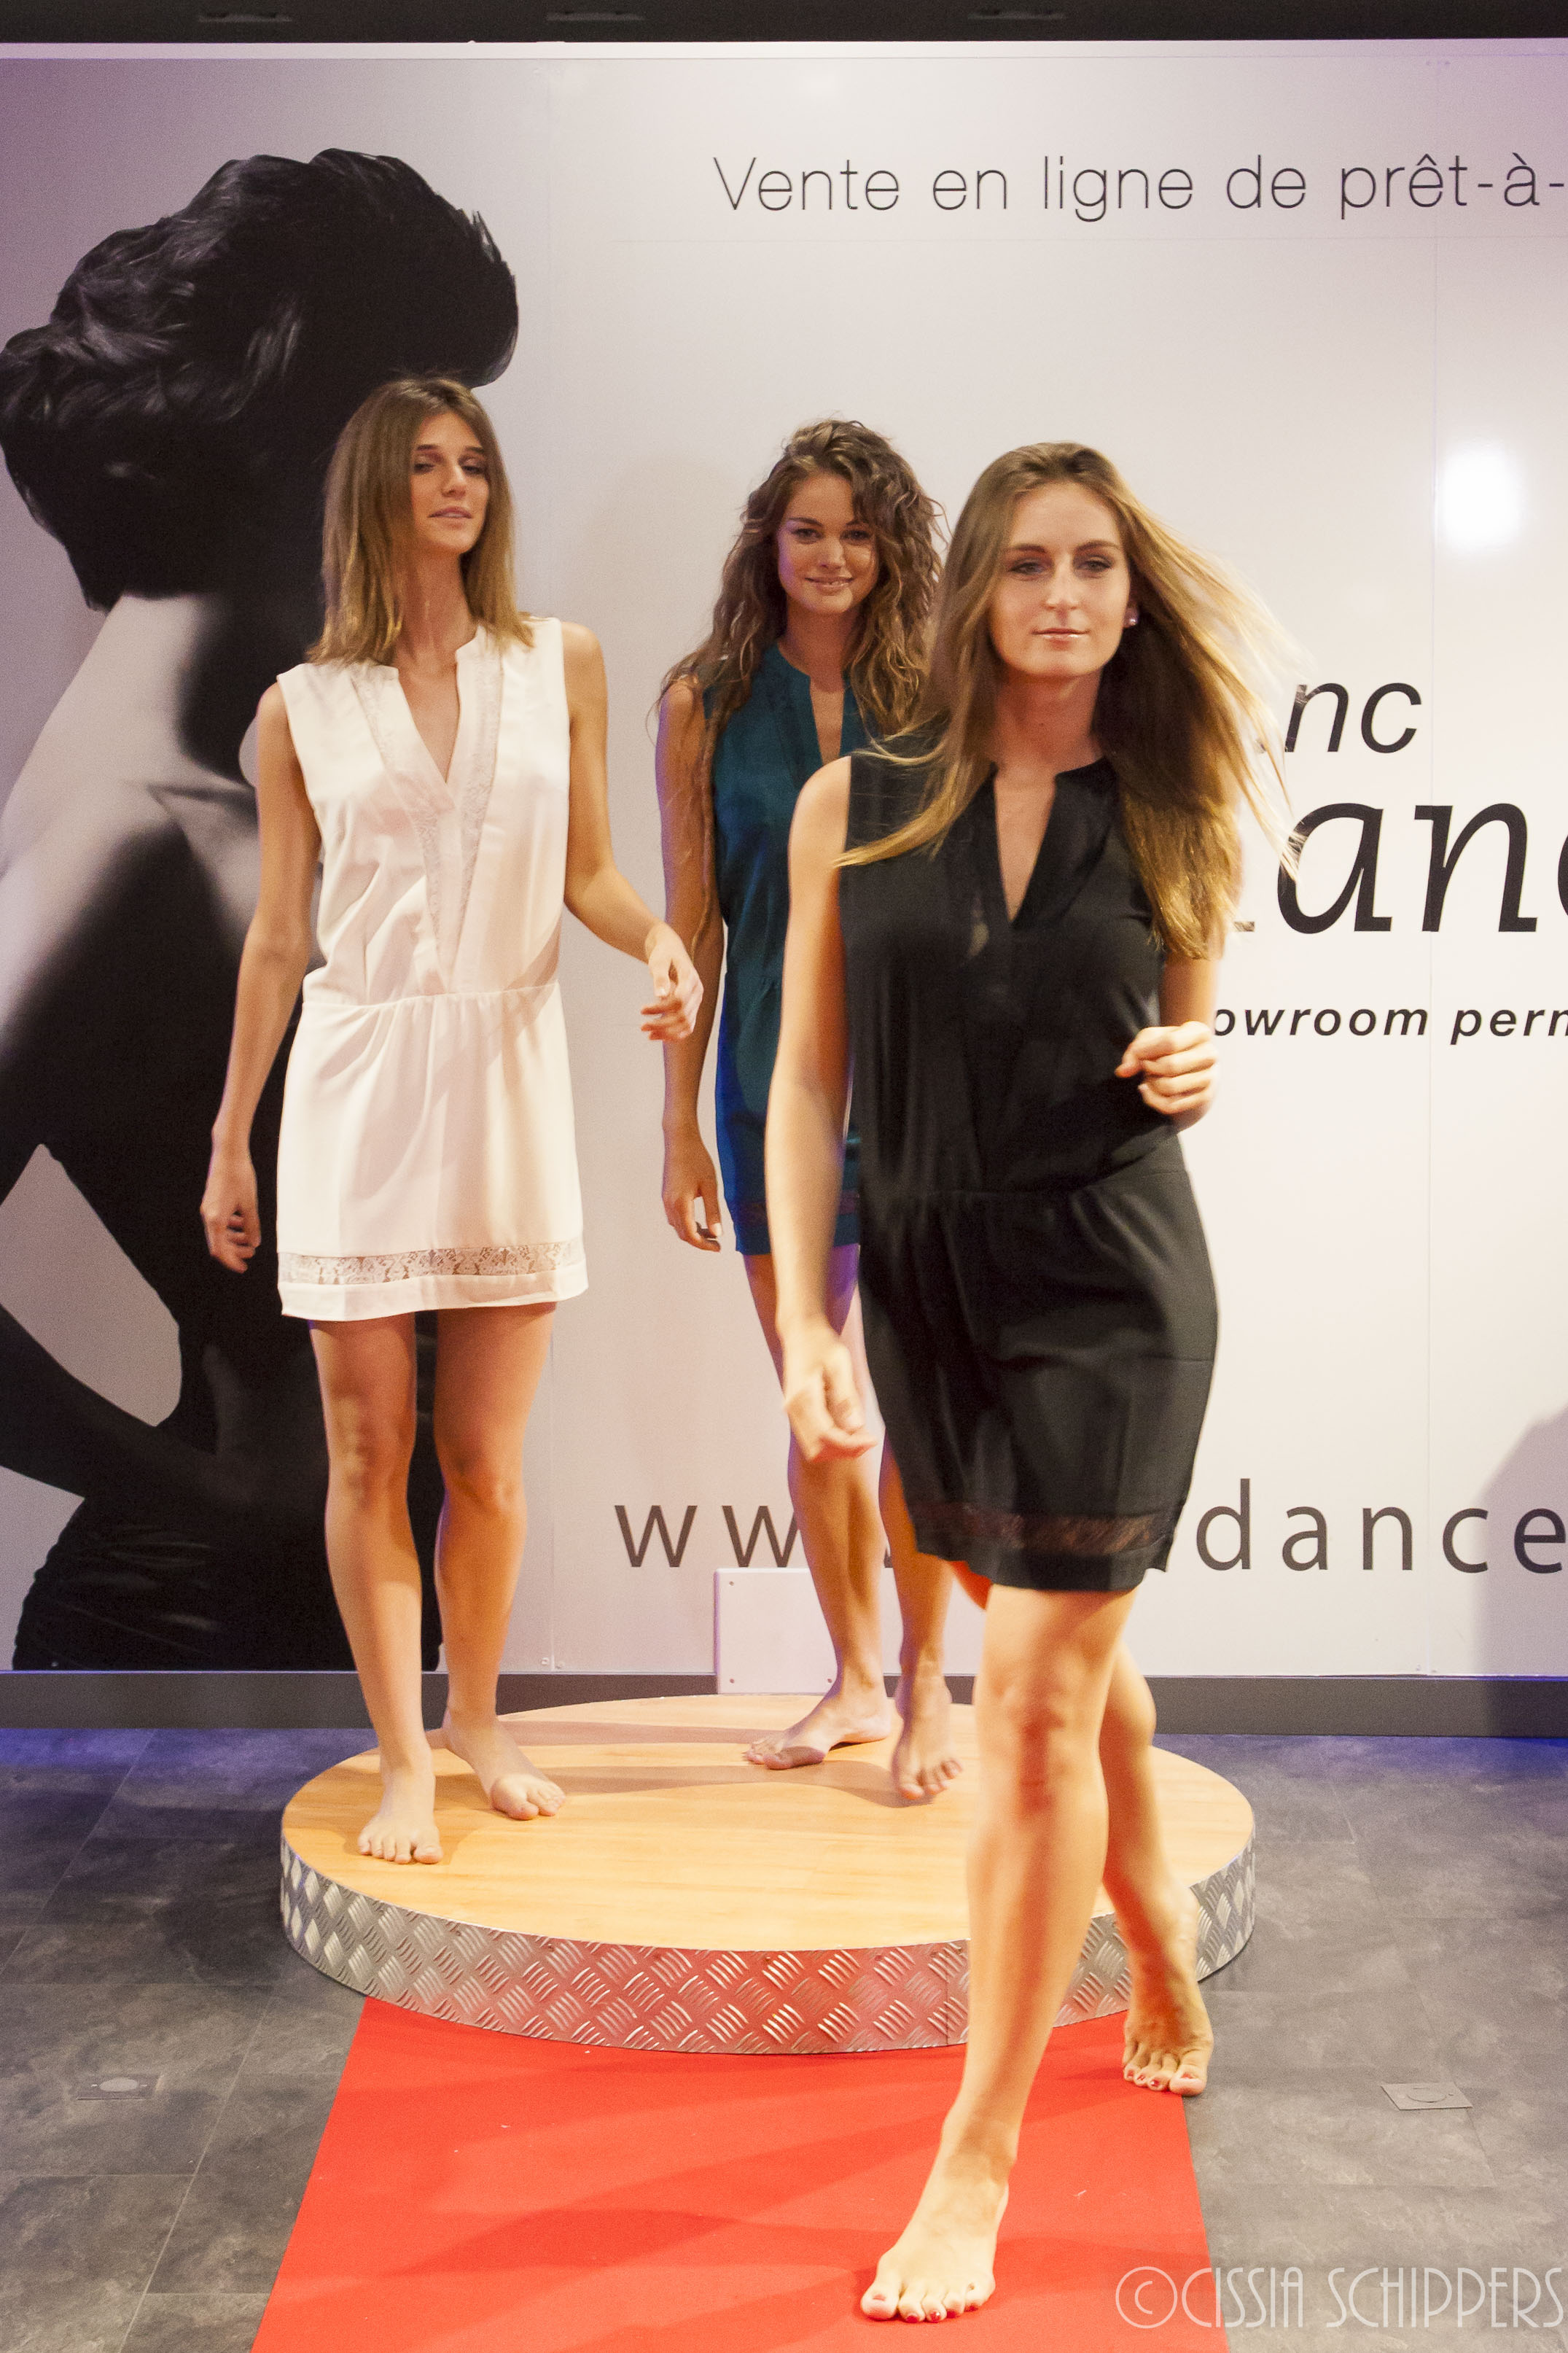 Tendance NC 2017 by Cissia Schippers photographe-8293